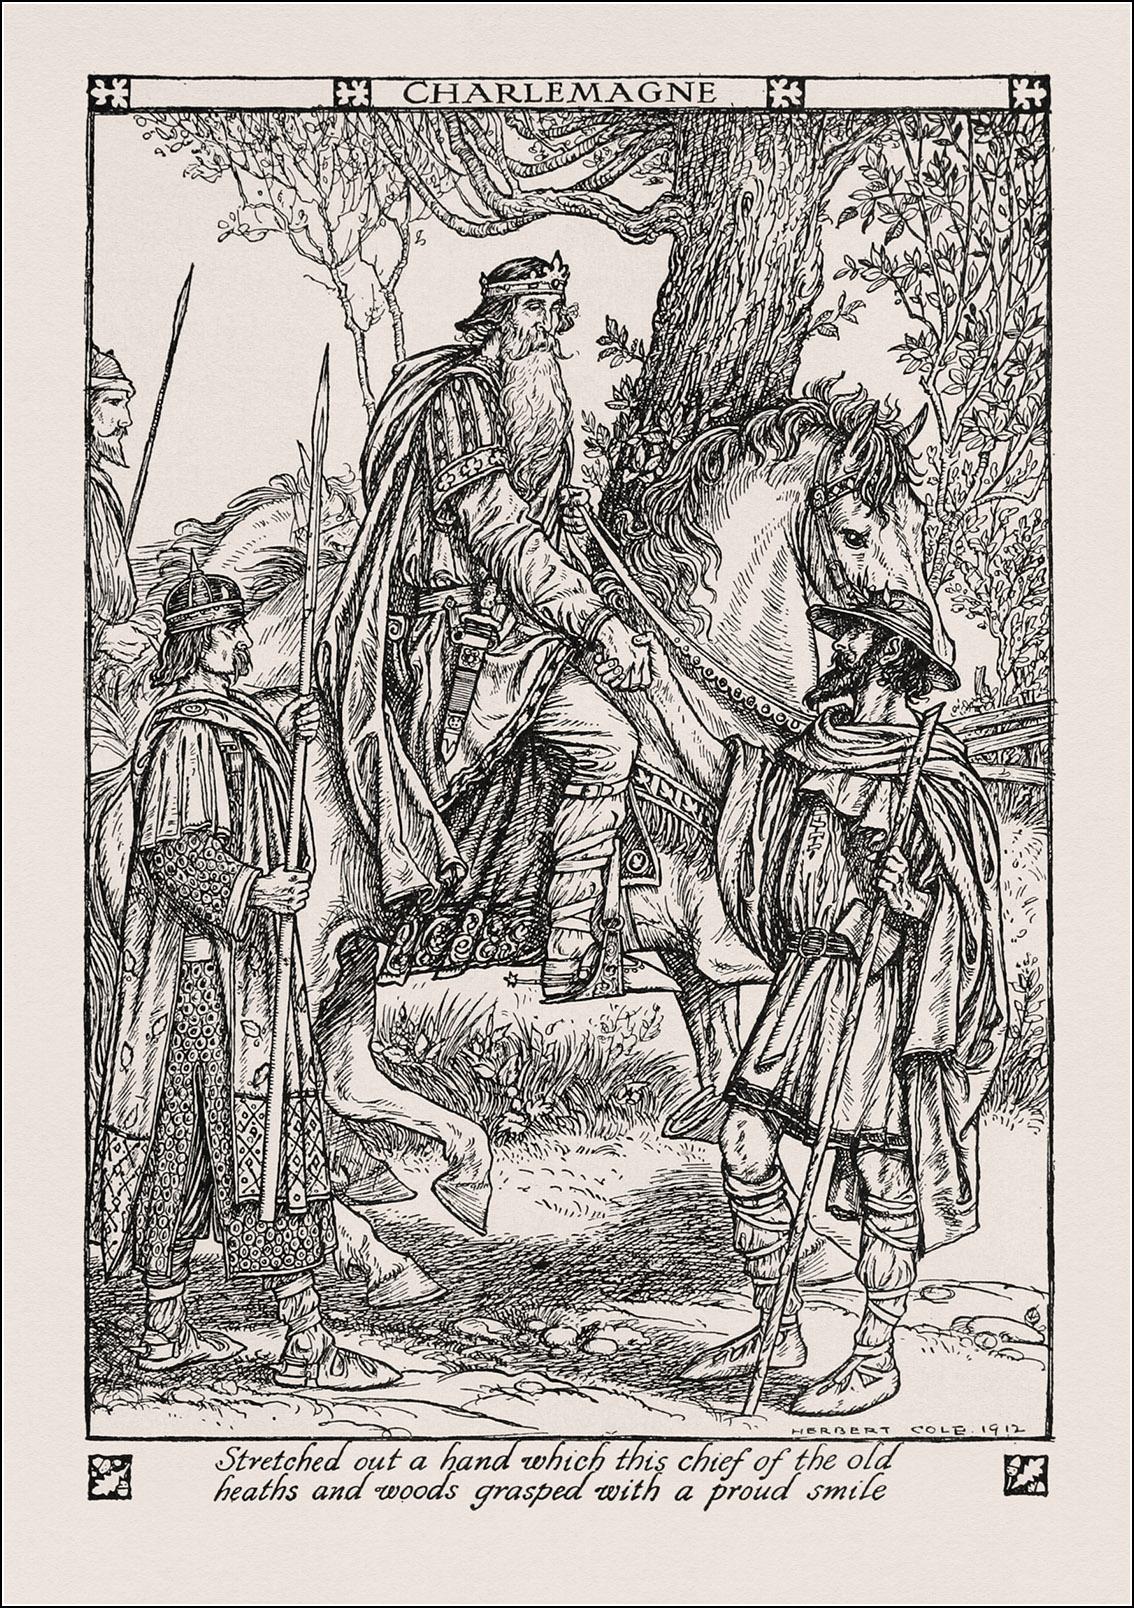 Herbert Cole, A child's book of warriors